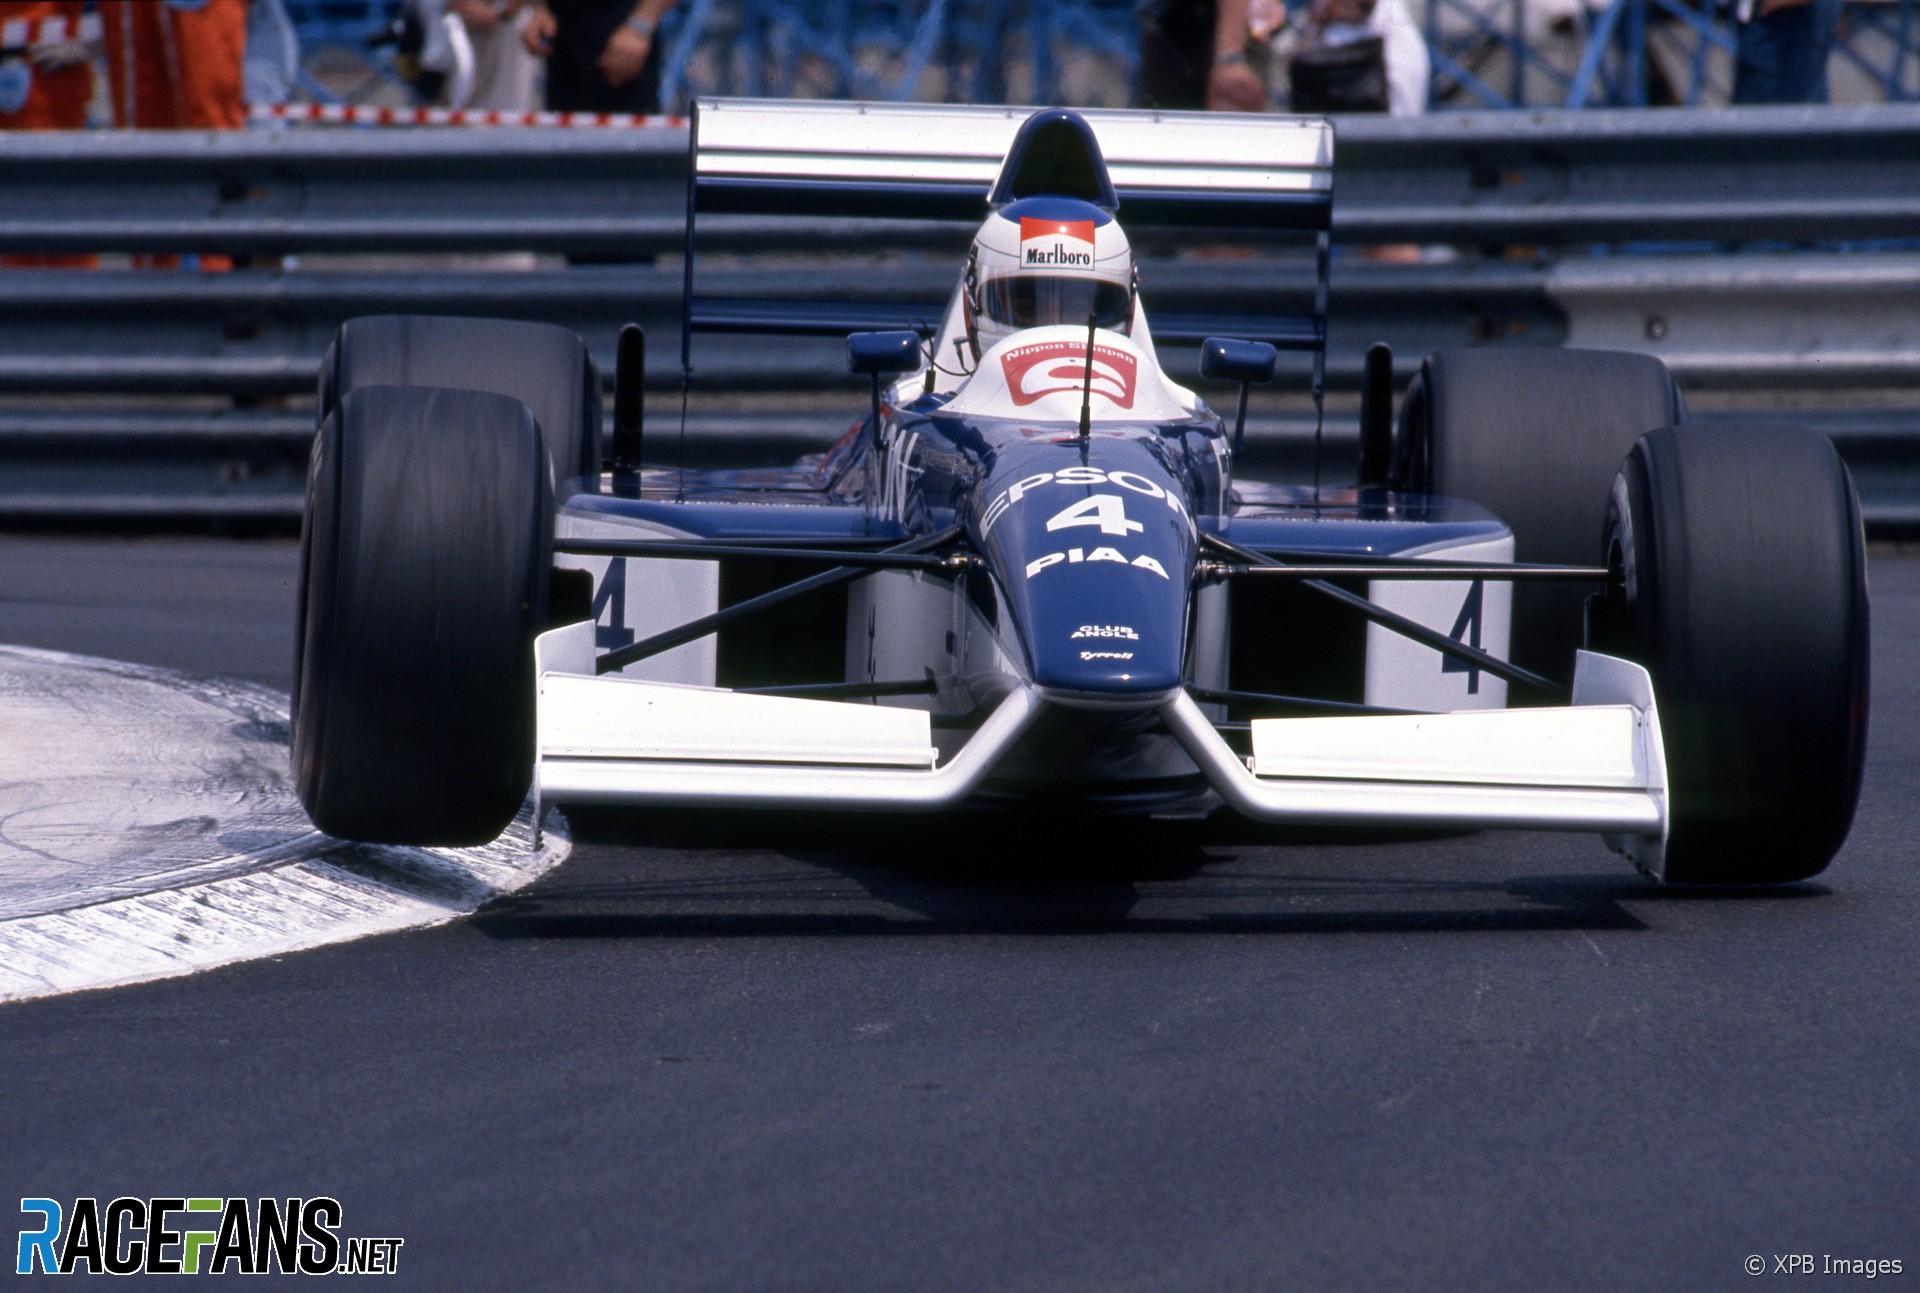 Jean Alesi, Tyrrell, Monaco, 1990